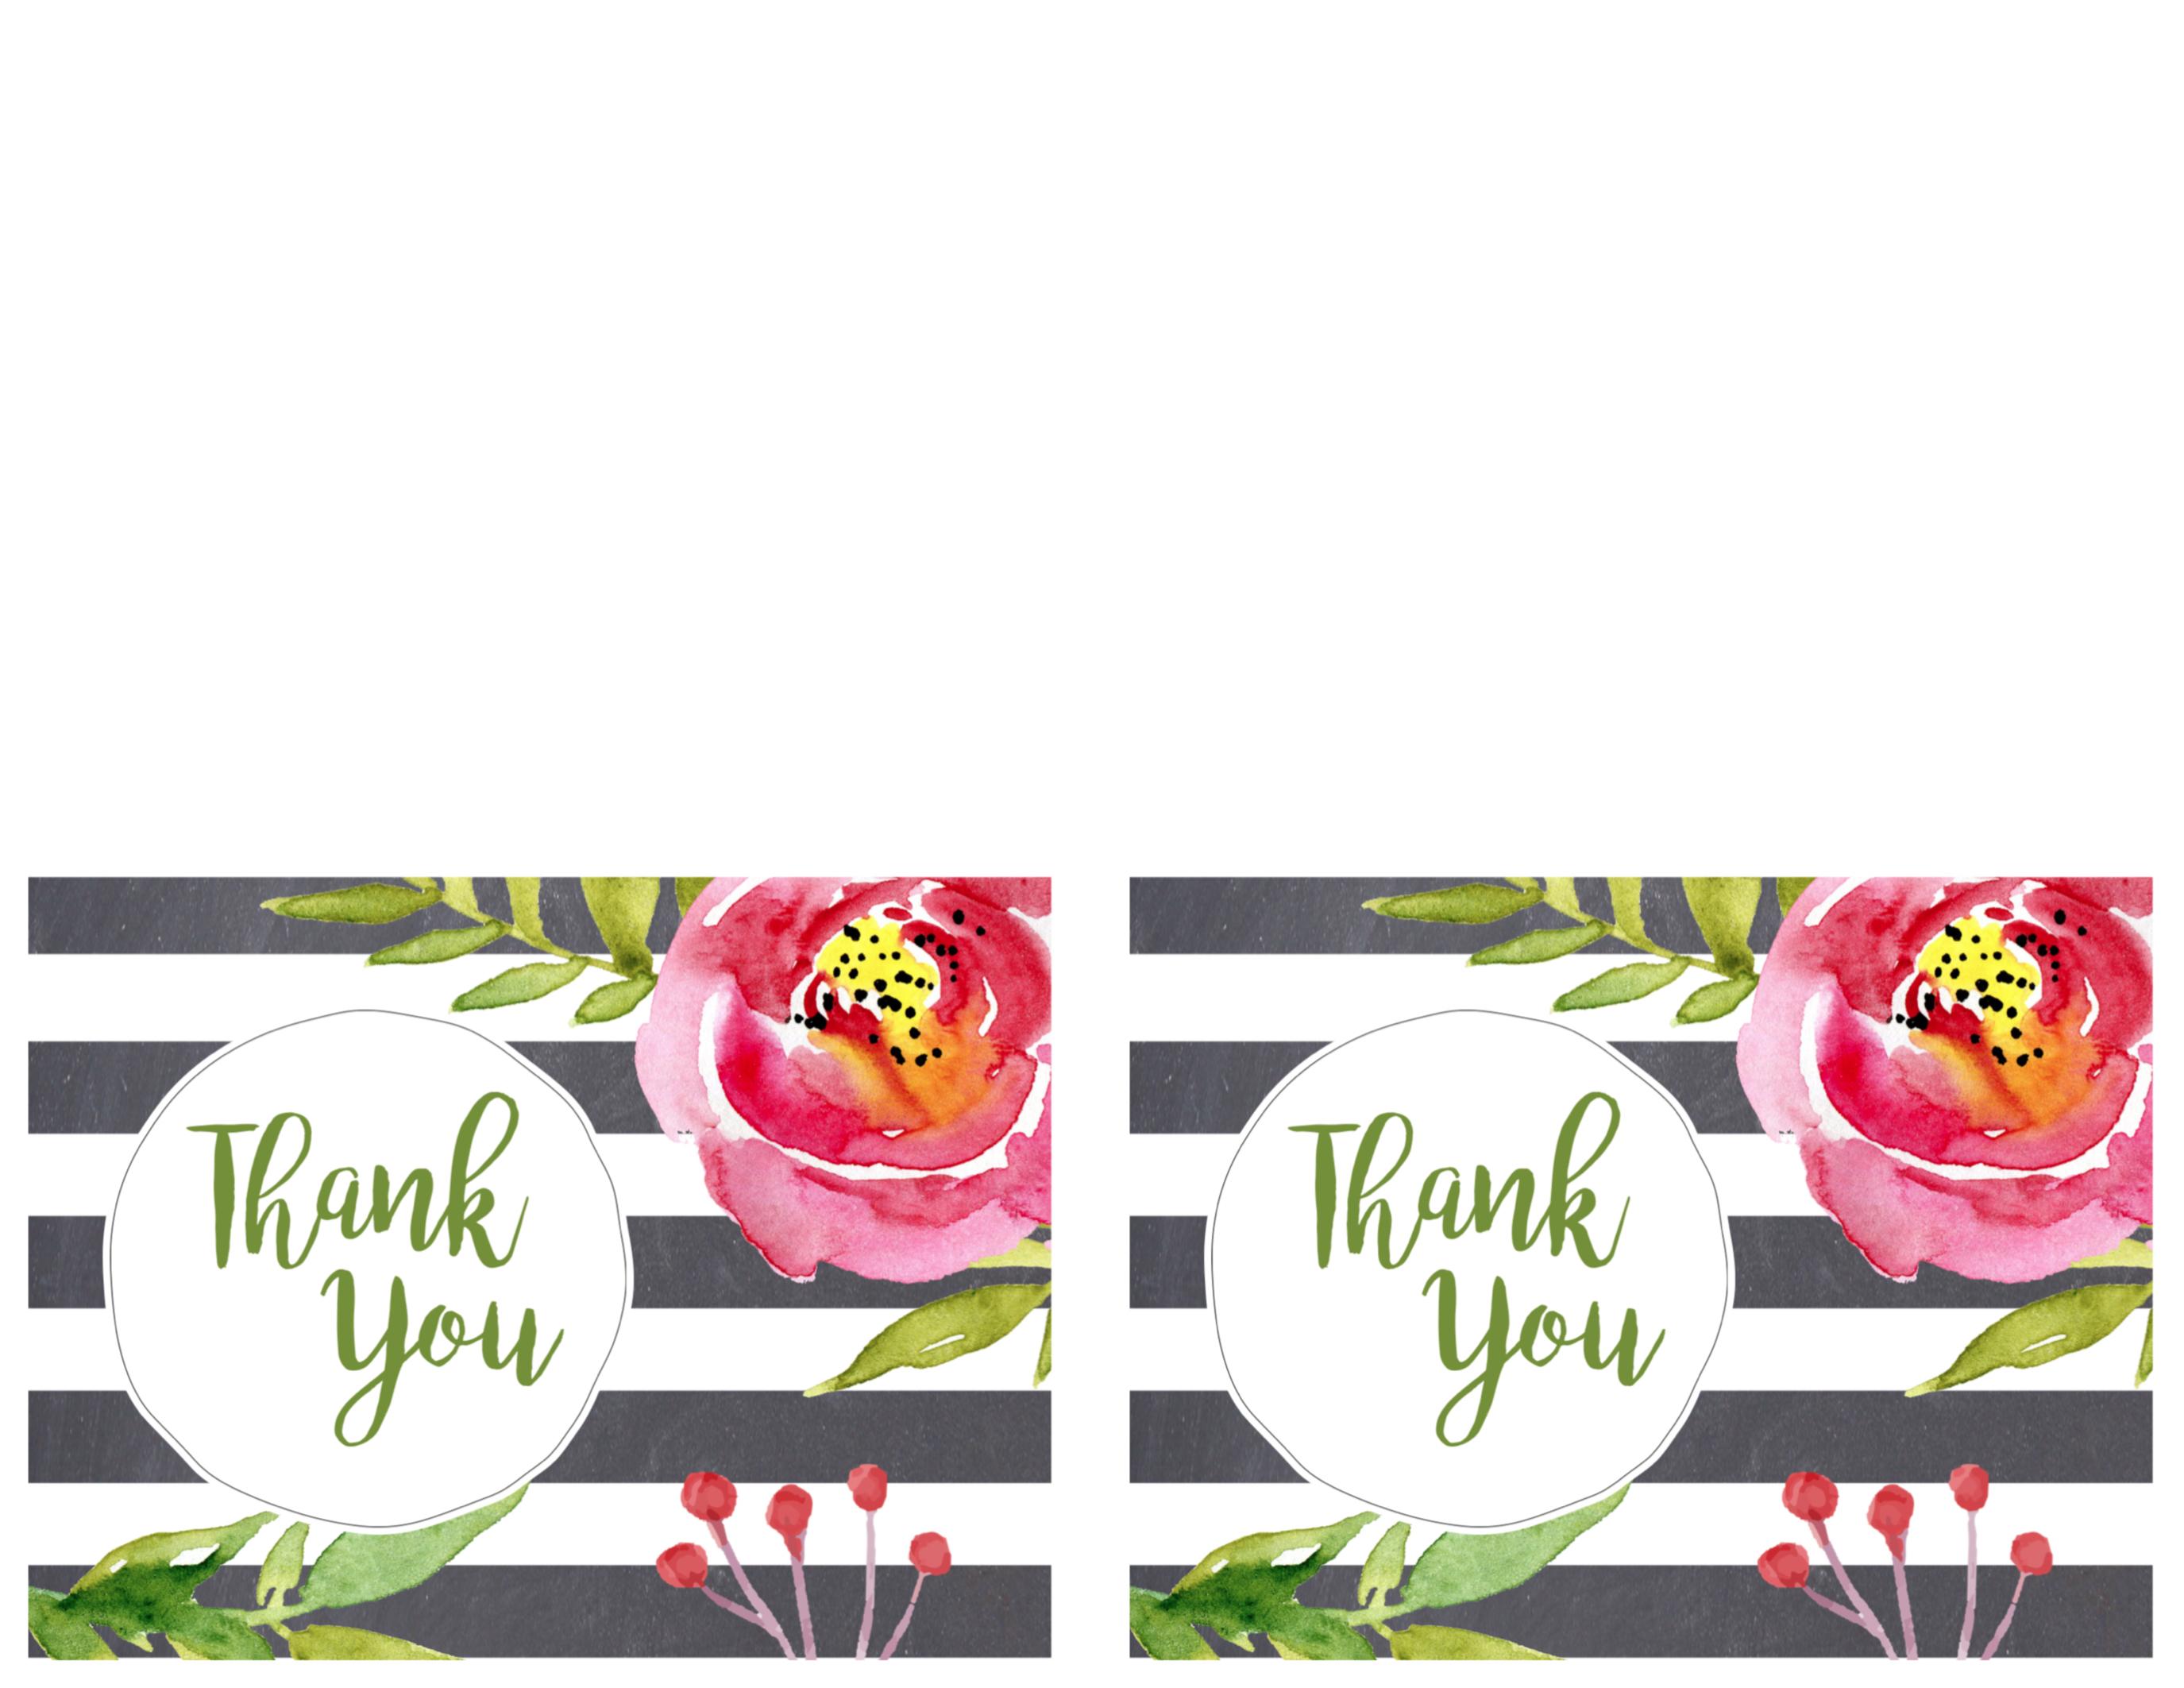 Happy Birthday Cards Printable Free Card Template 05 Certificate - Free Printable Birthday Cards For Mom